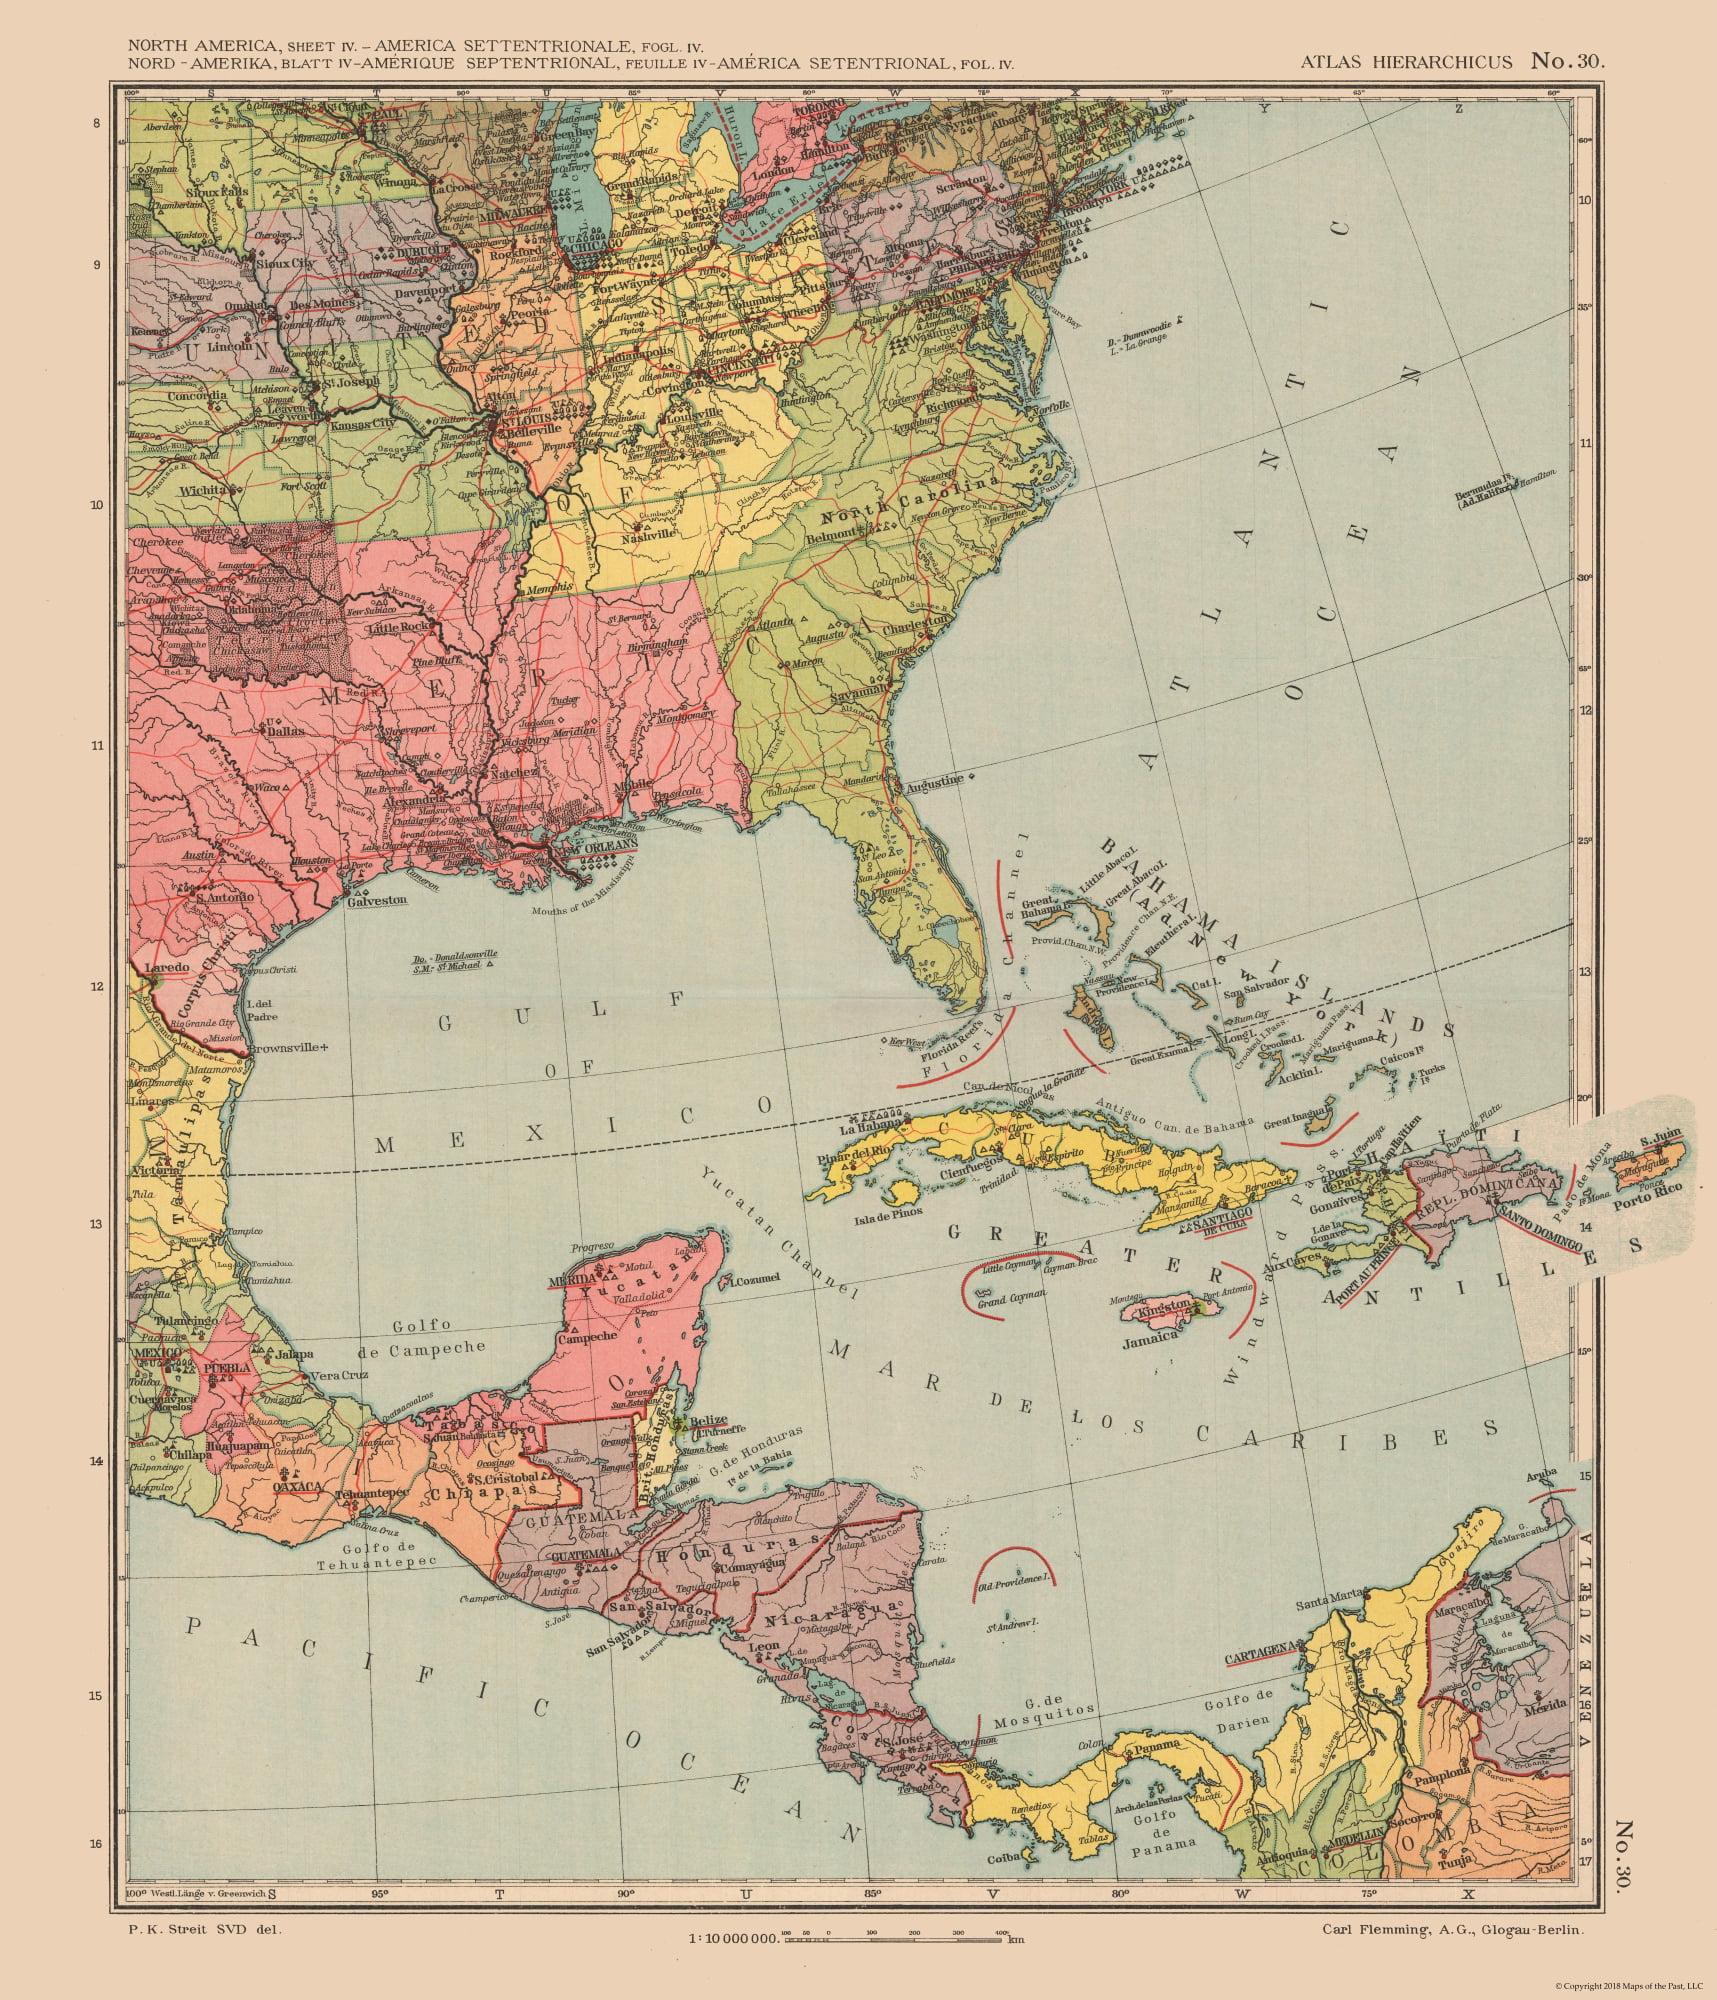 United States Central America - Streit 1913 - 23 x 26.79